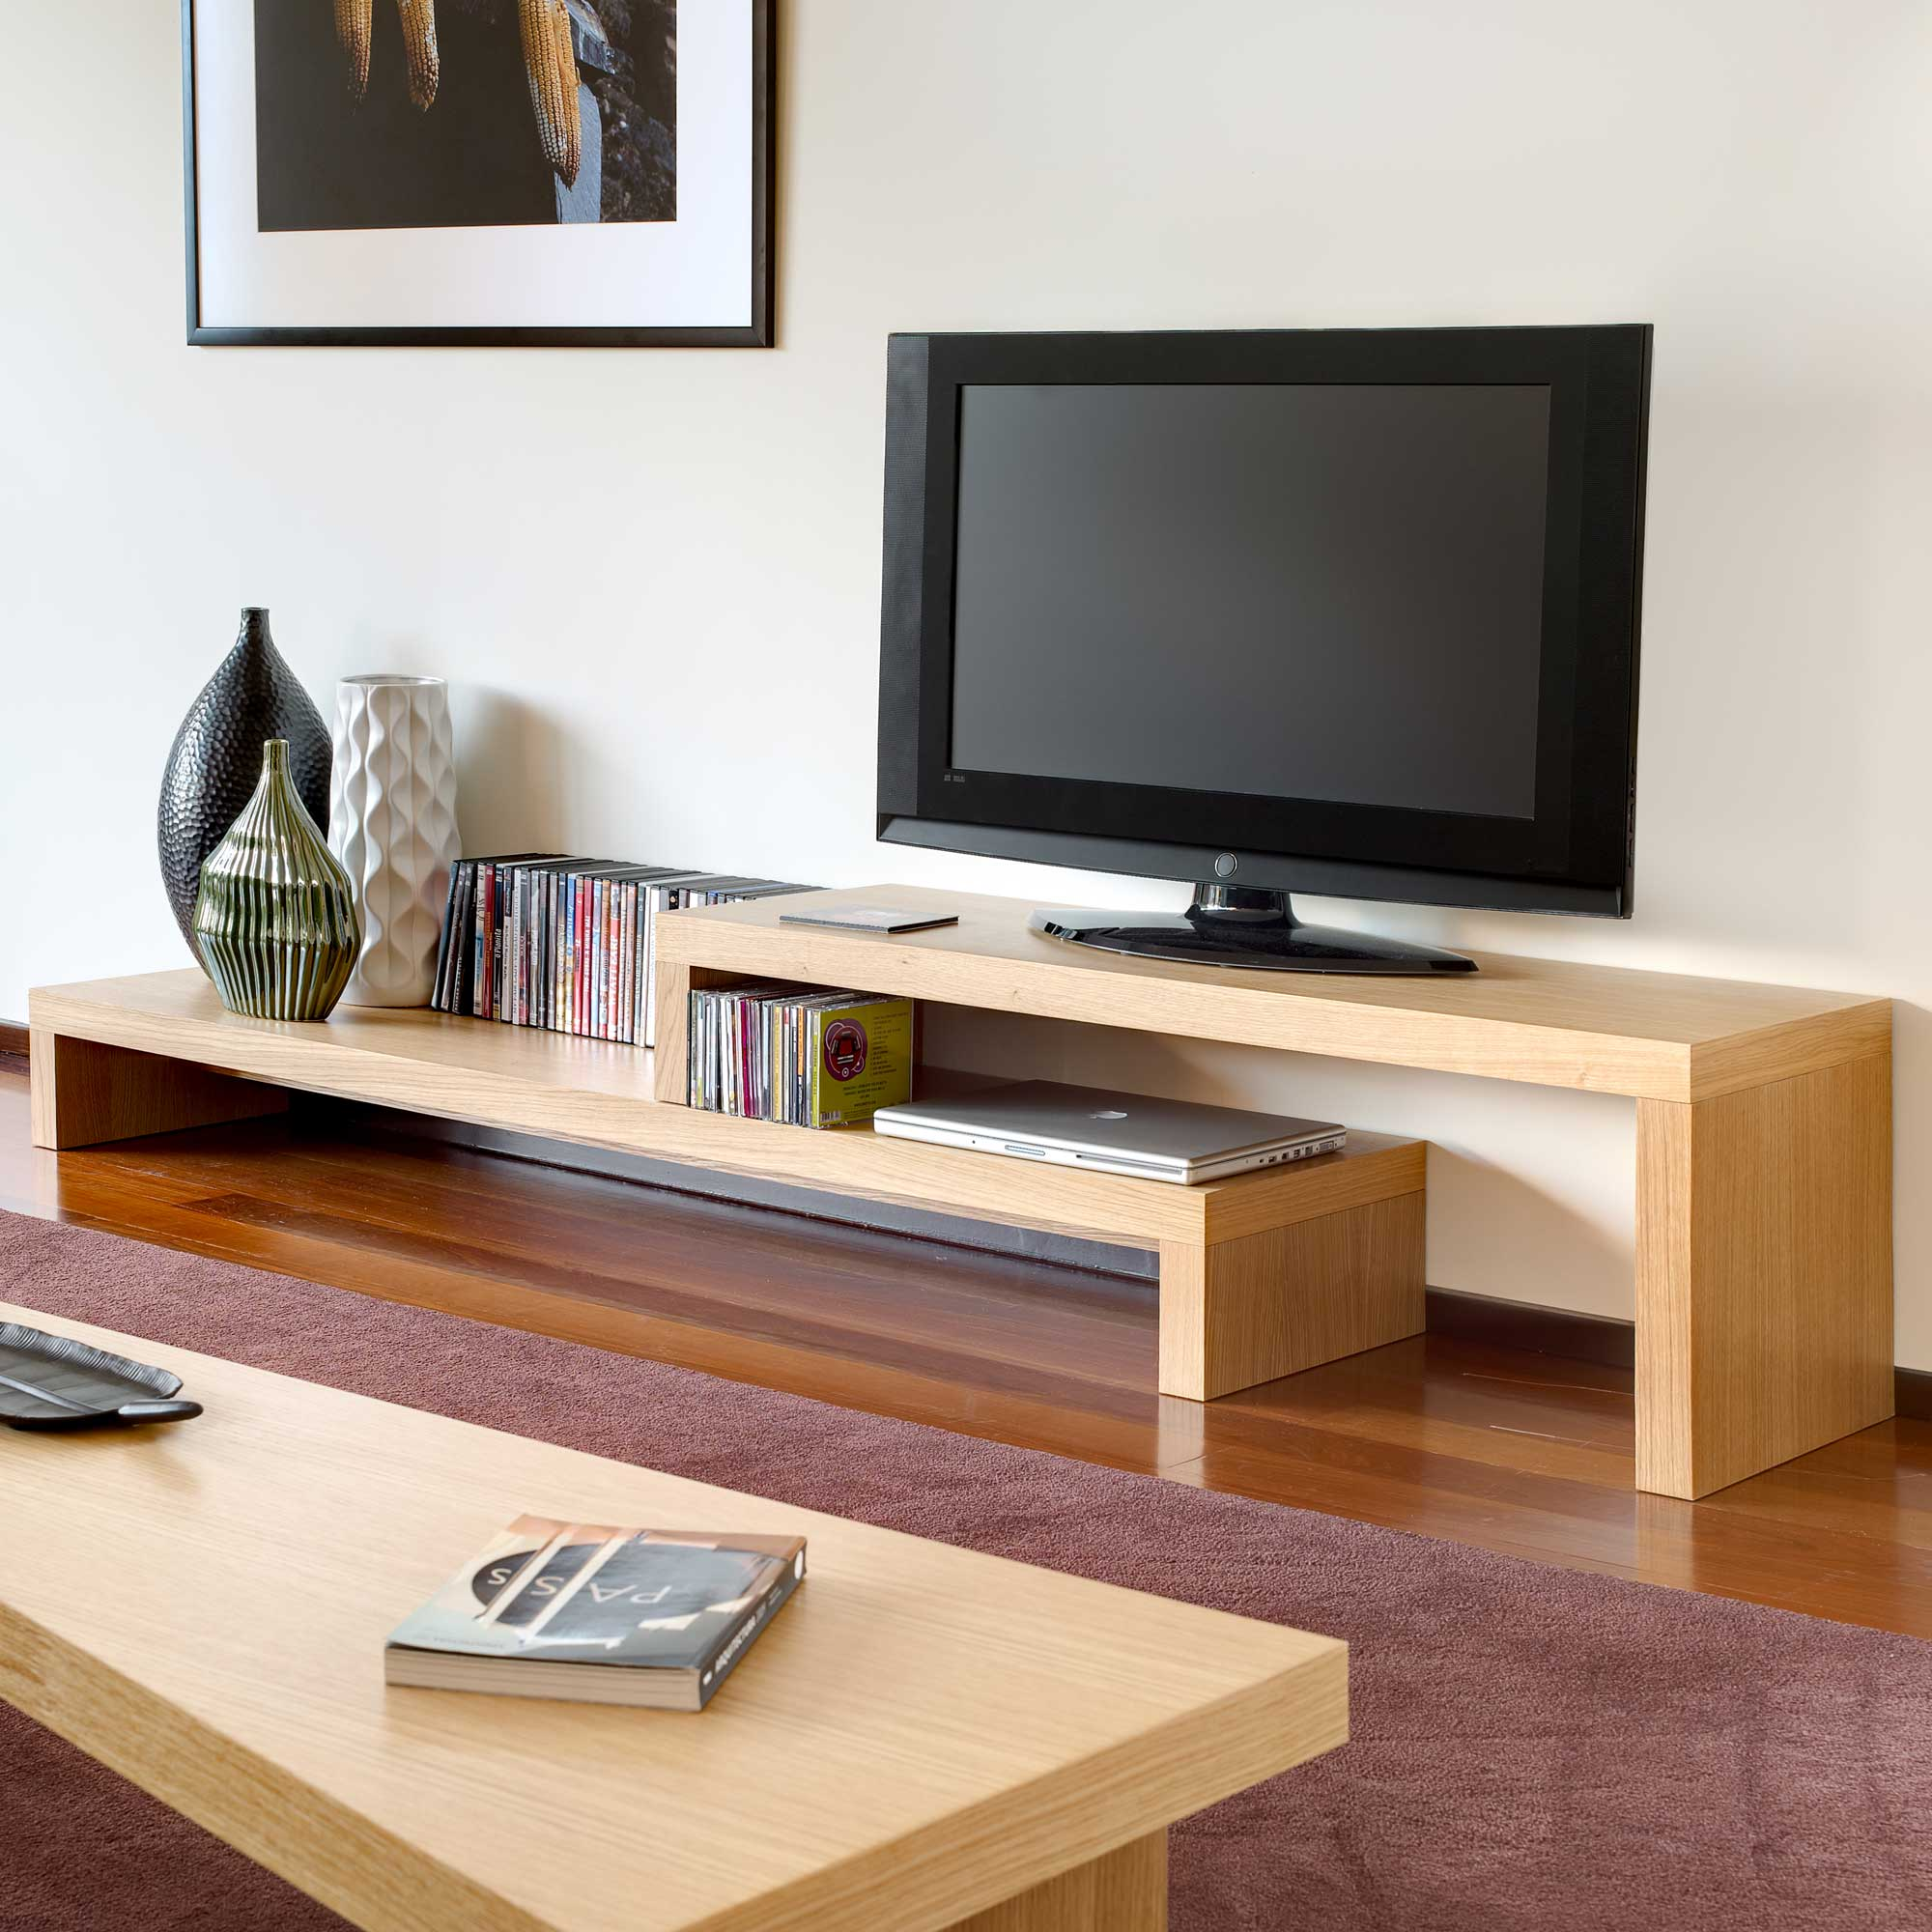 fabriquer un meuble tv suspendu - Fabriquer Un Meuble Tv Bas